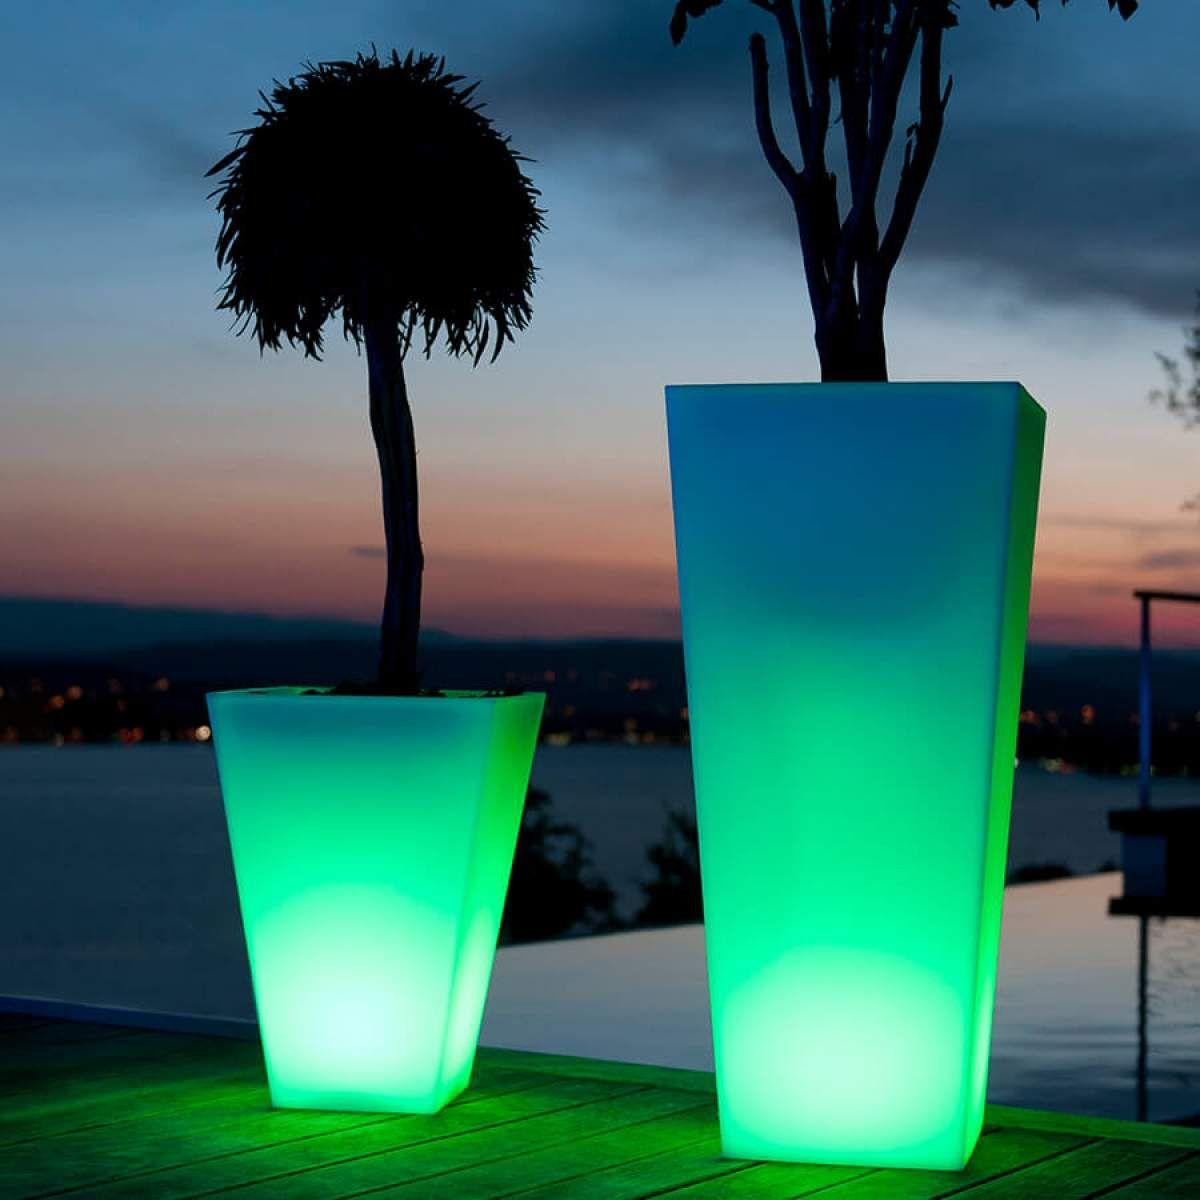 Bluetooth Steuerbarer Led Blumentopf Rumba 50 Cm Im Freien Pflanzen Und Aussenbeleuchtung